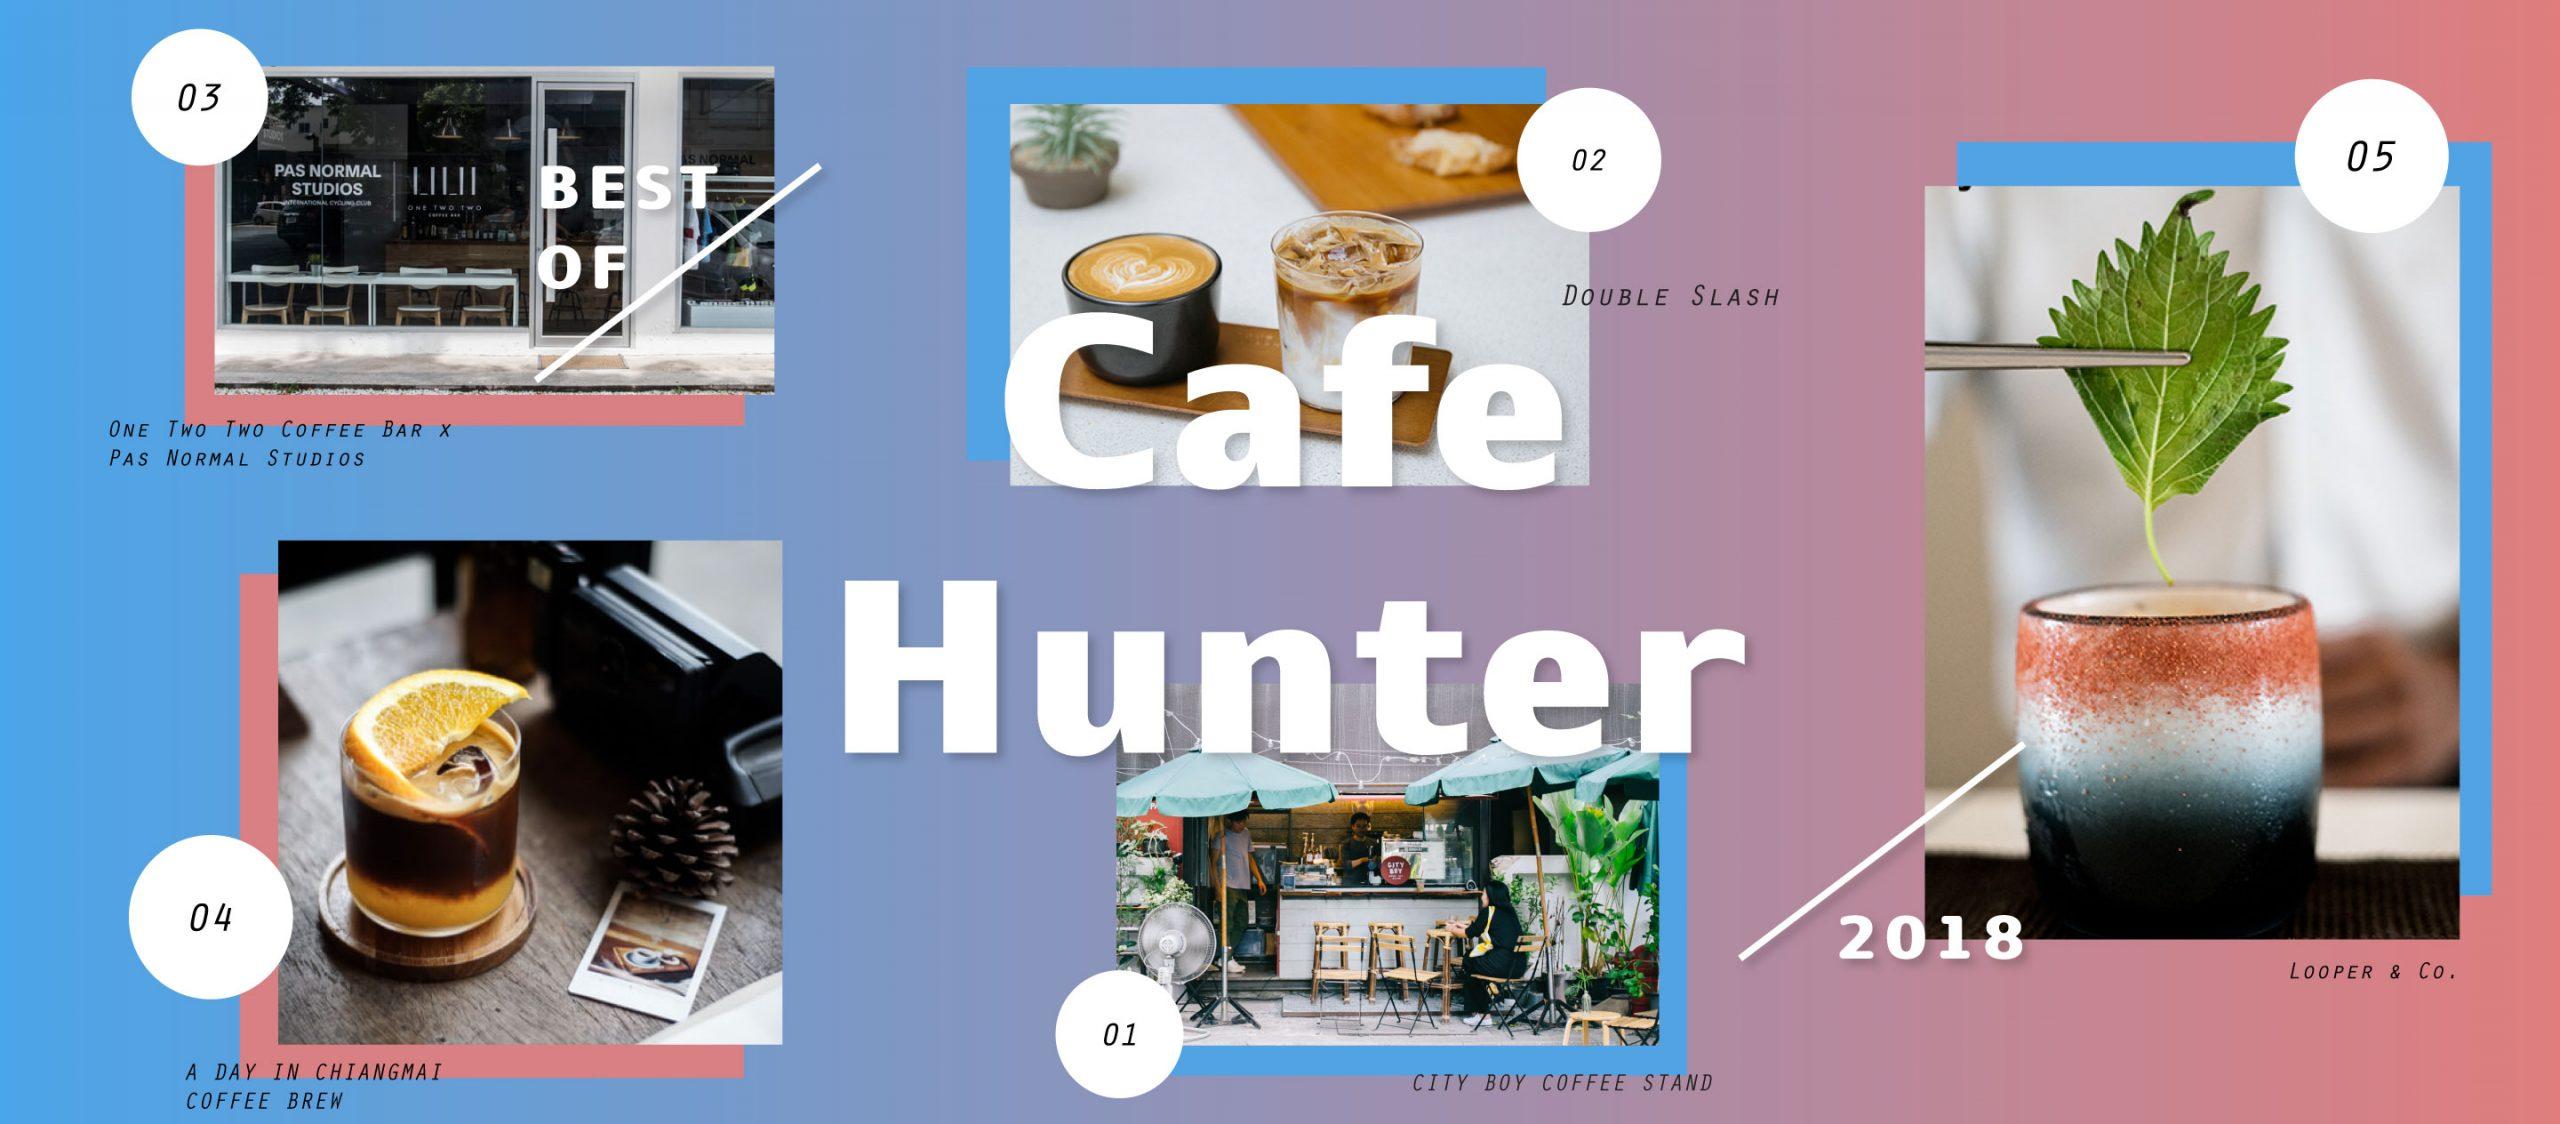 best of a day online : café hunter